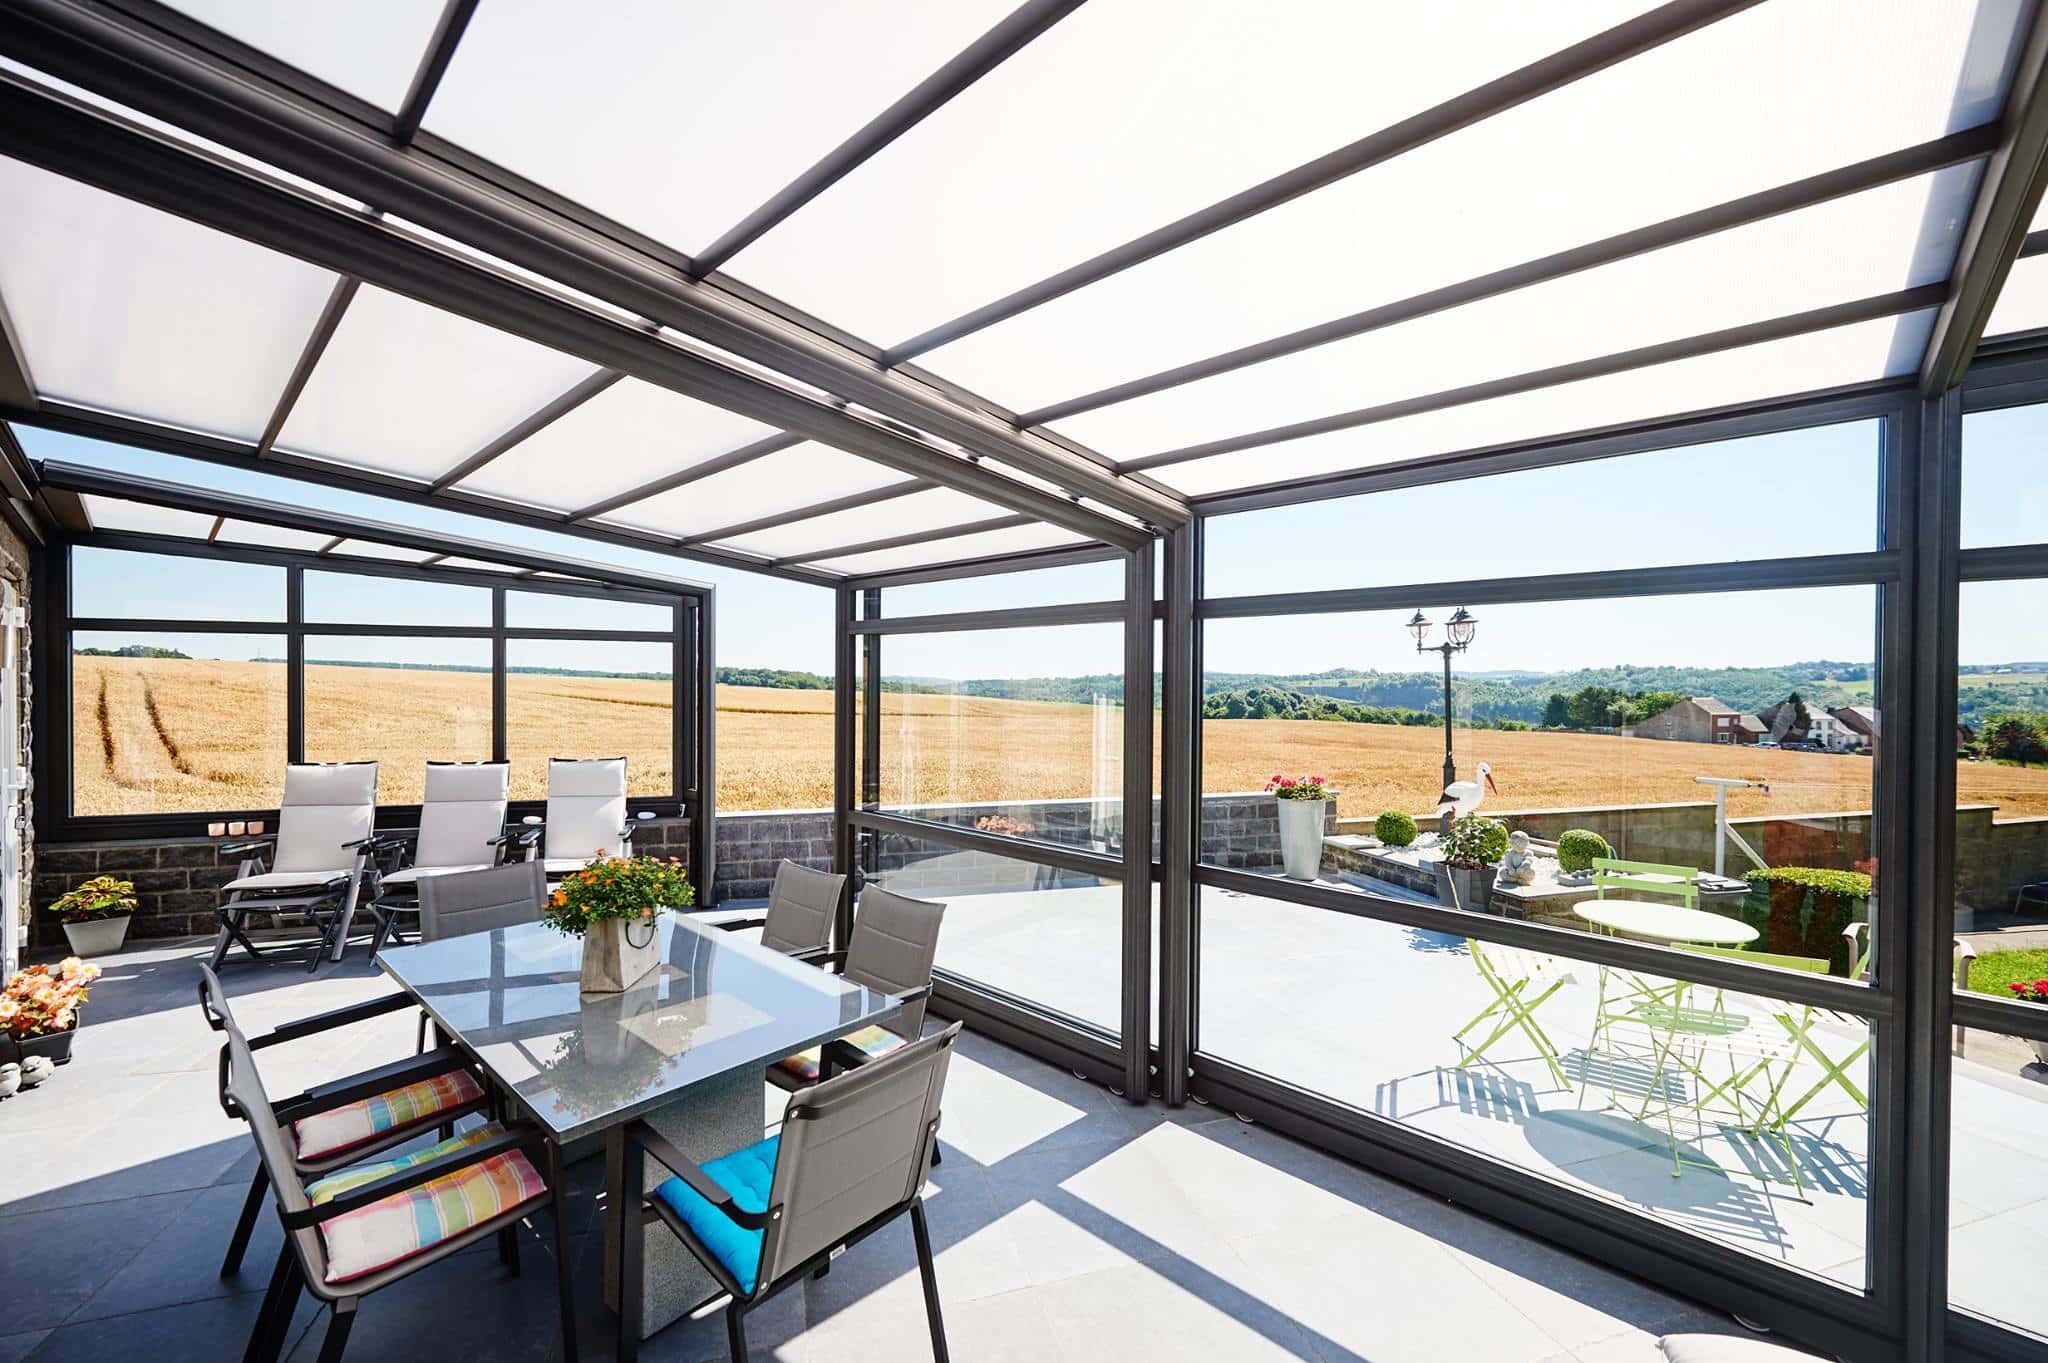 une v randa r tractable pour profiter de votre terrasse malgr l 39 hiver. Black Bedroom Furniture Sets. Home Design Ideas